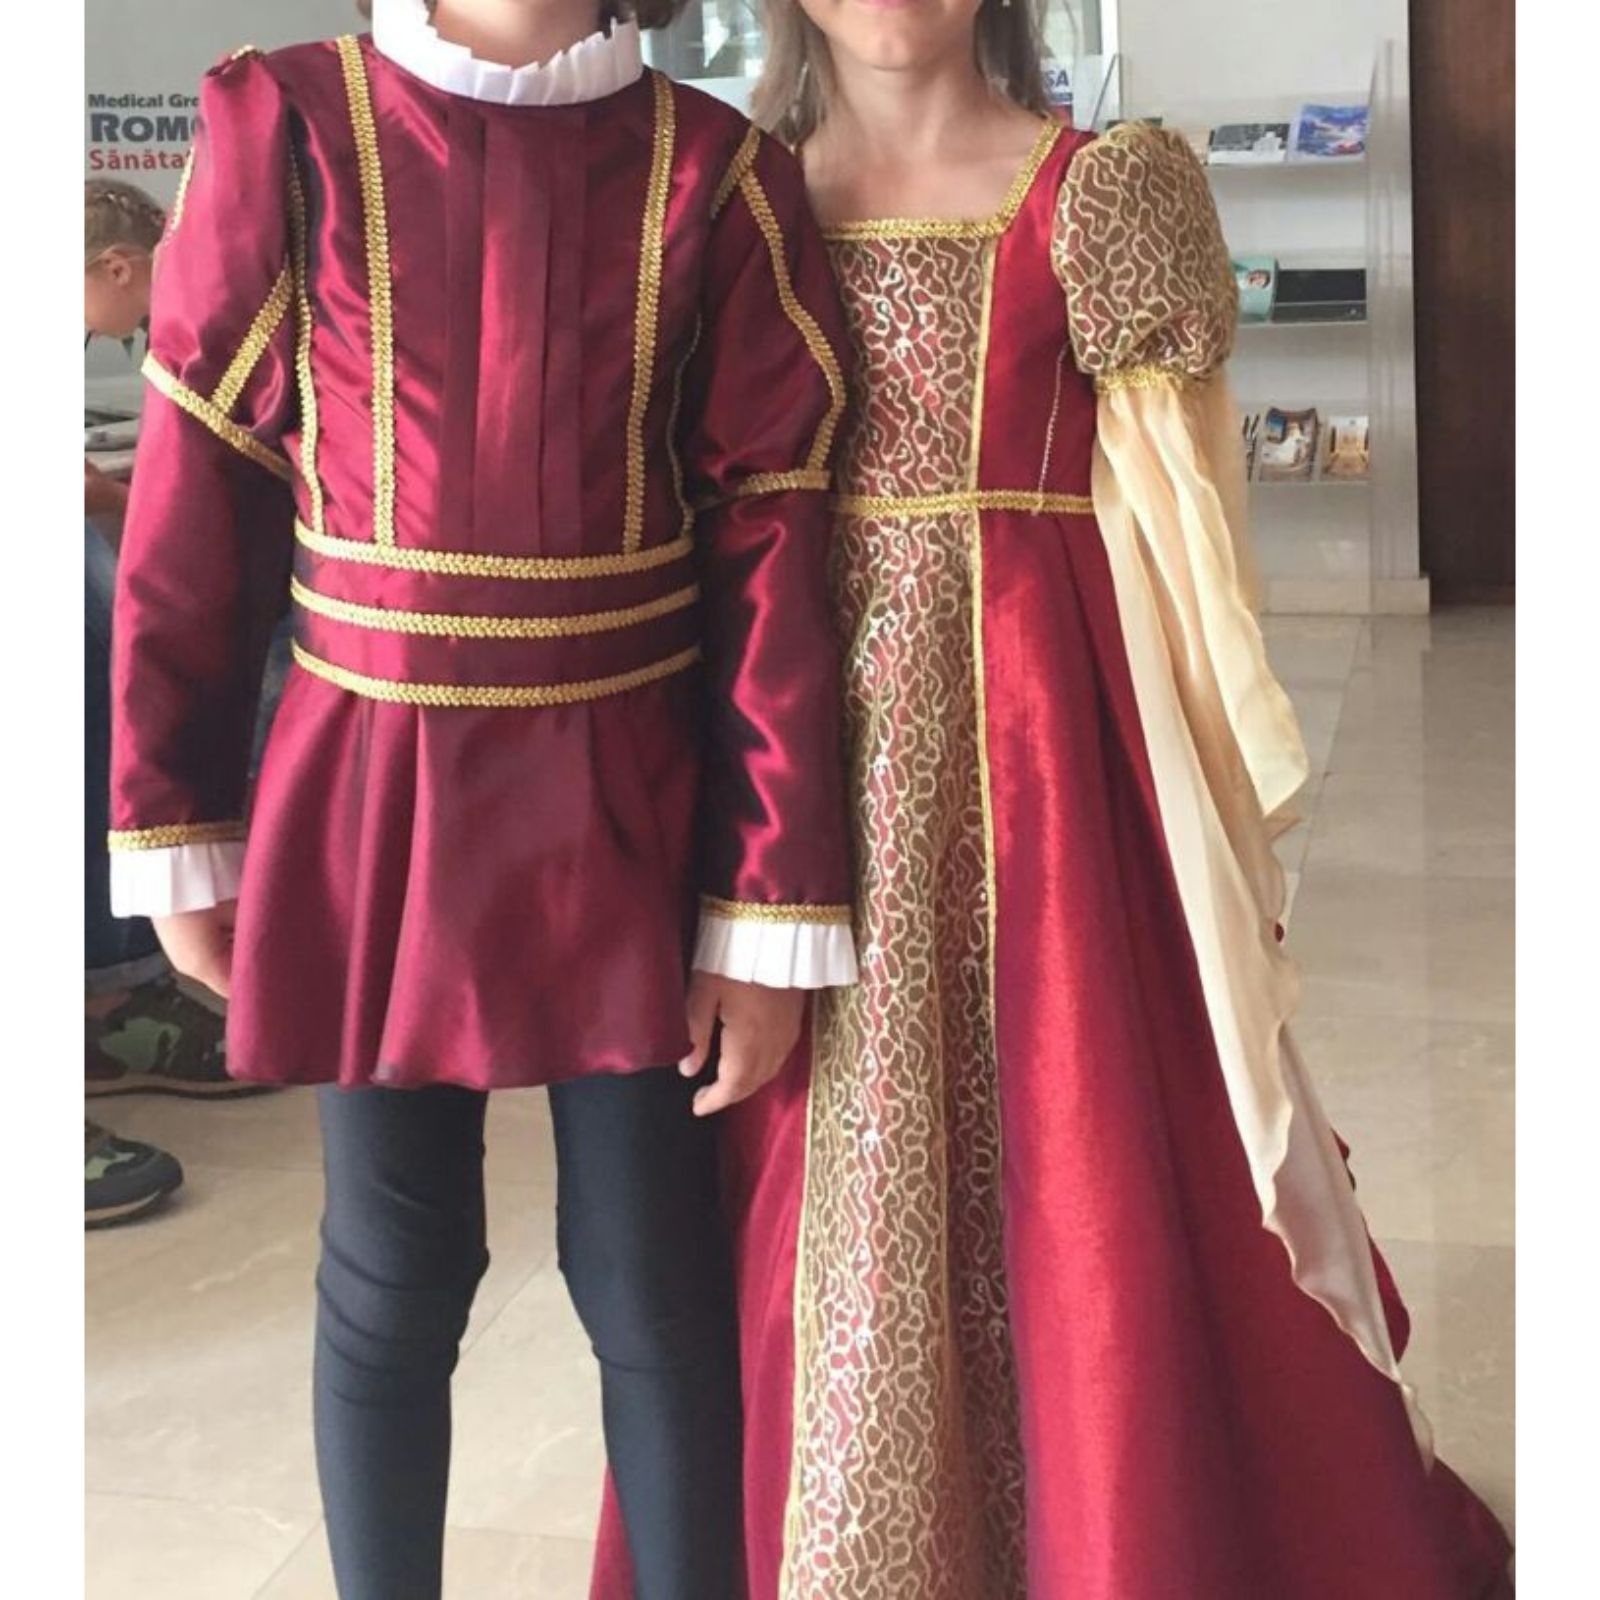 Rochita medievala fete Julieta (Romeo si Julieta)